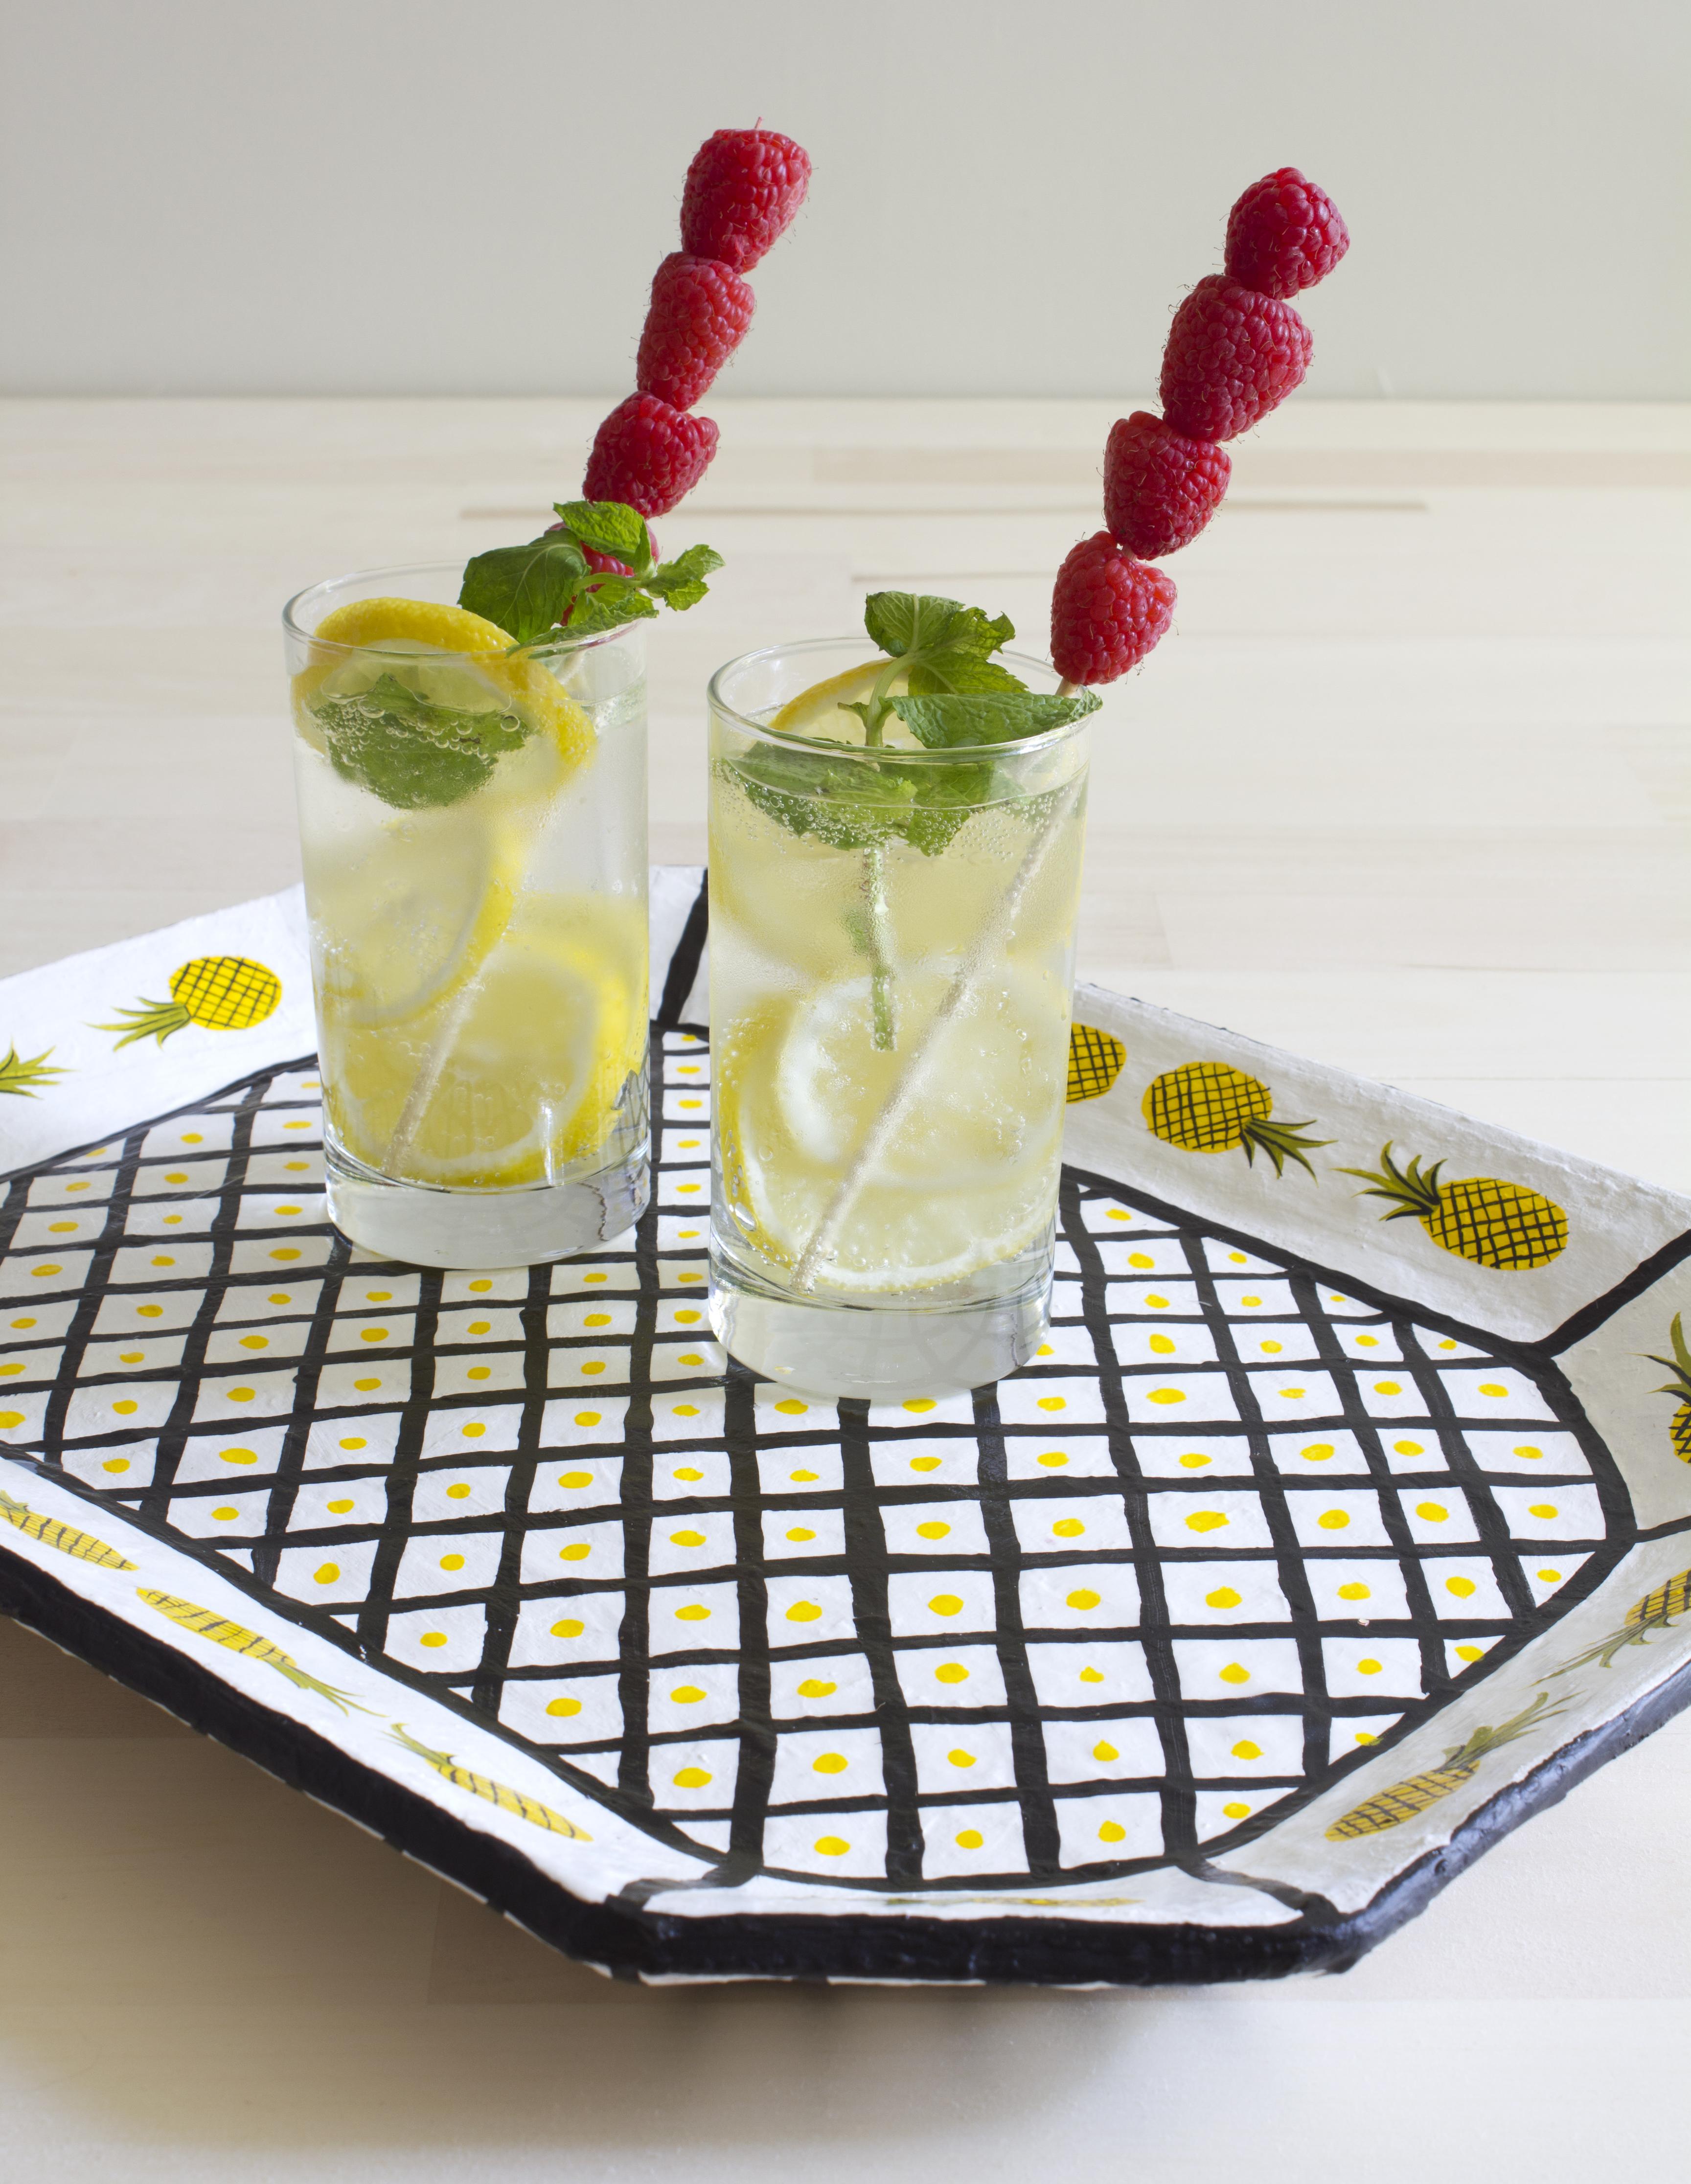 Paper mache pineapple tray